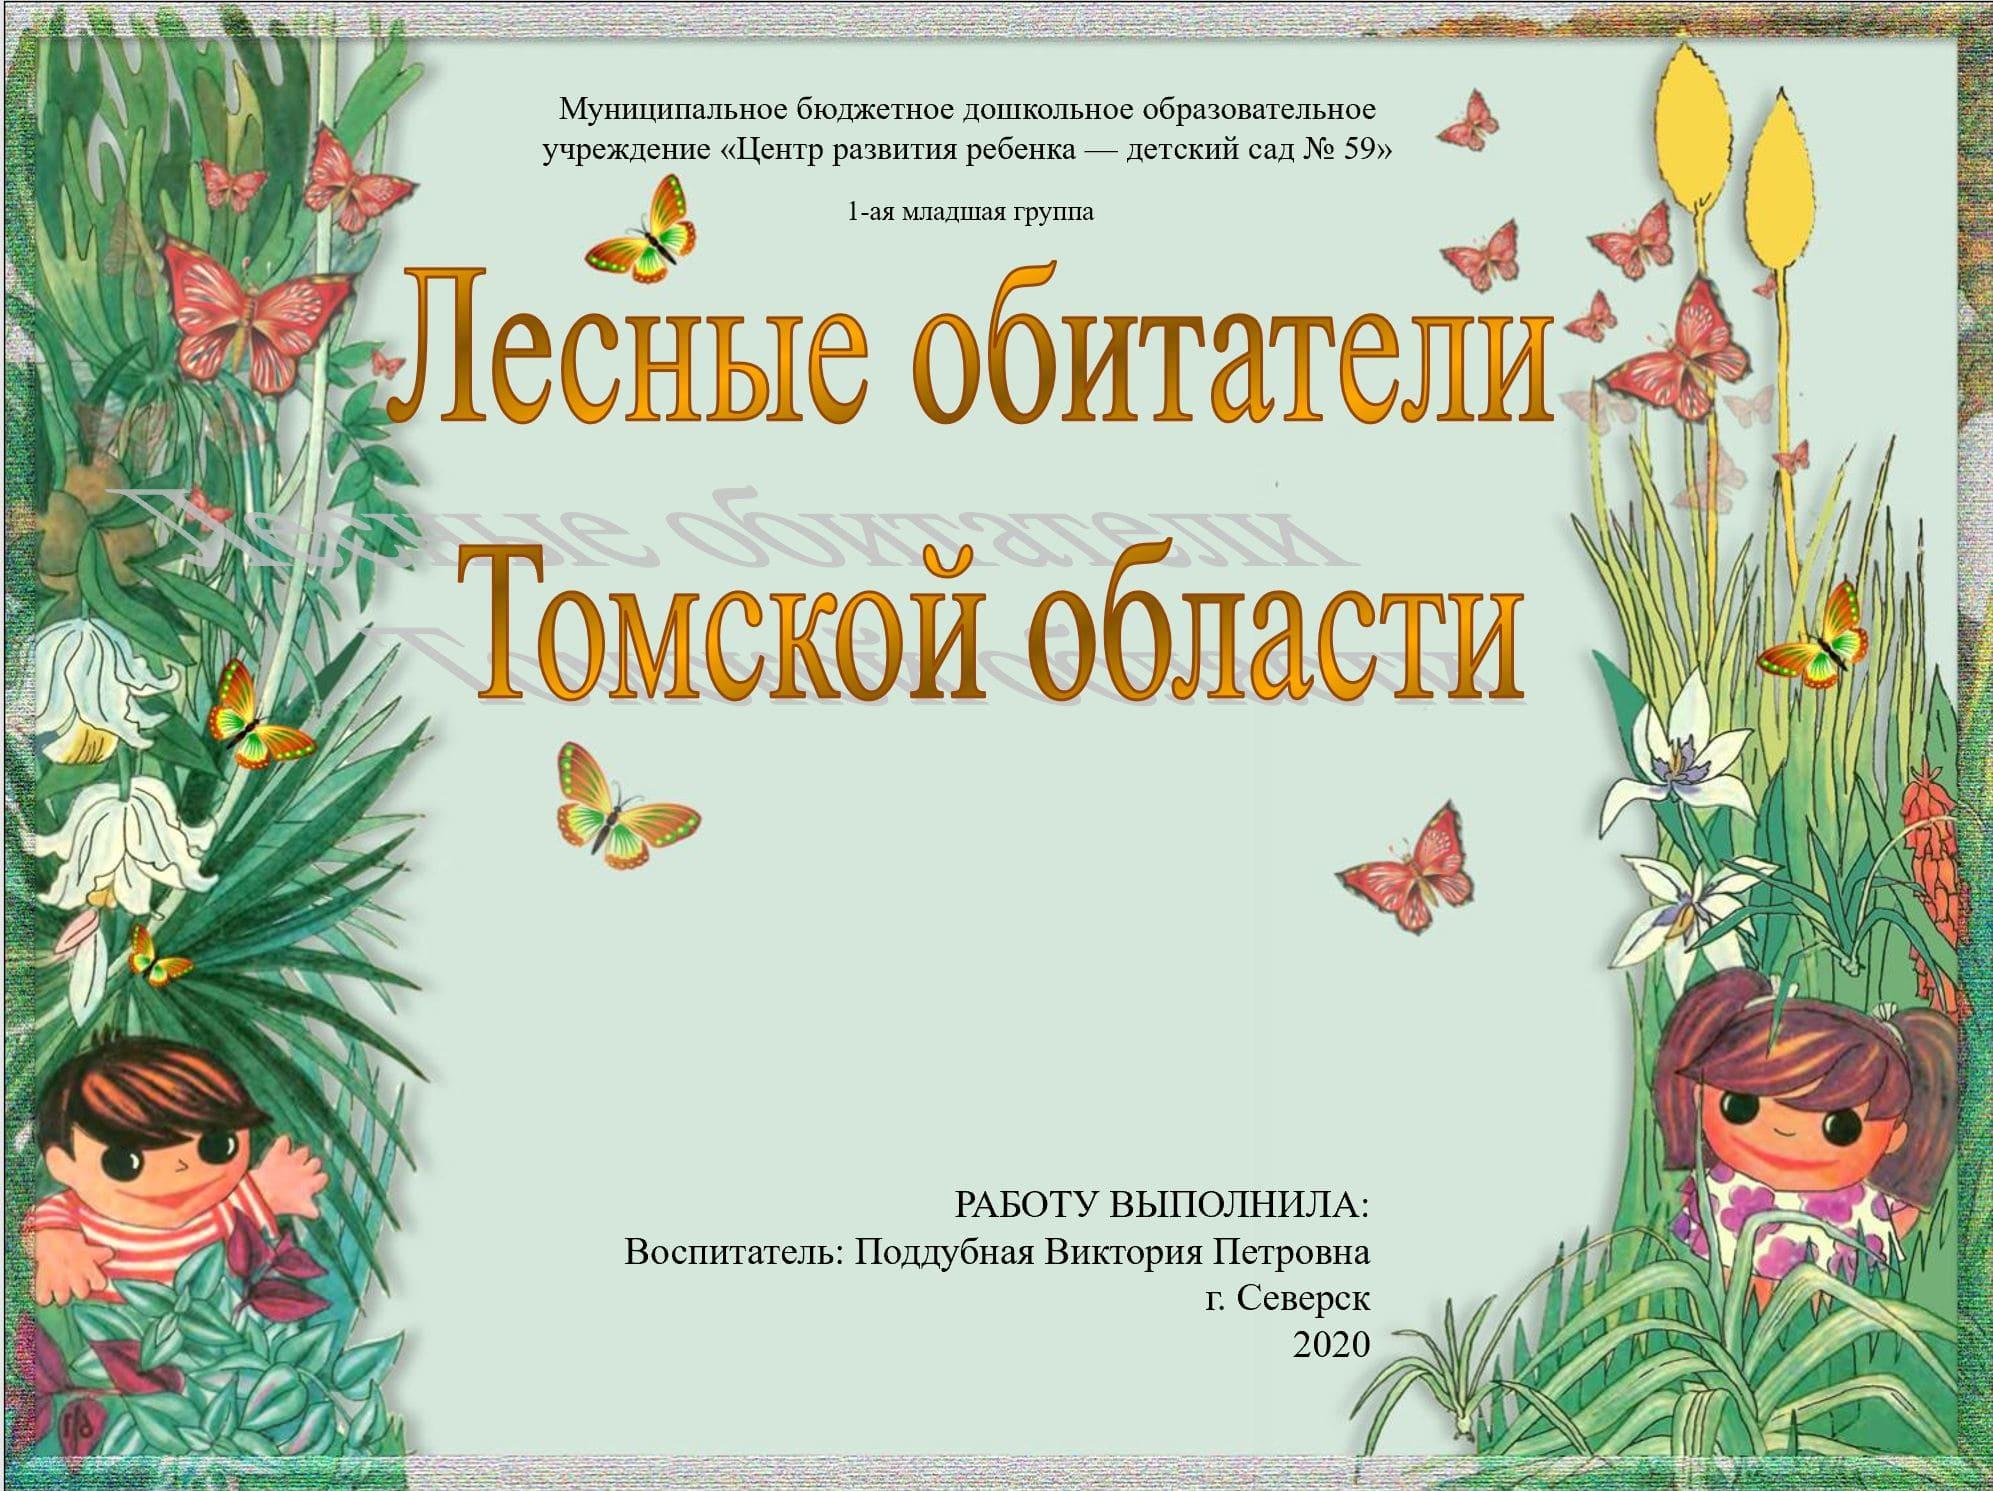 Поддубная Виктрия Петровна